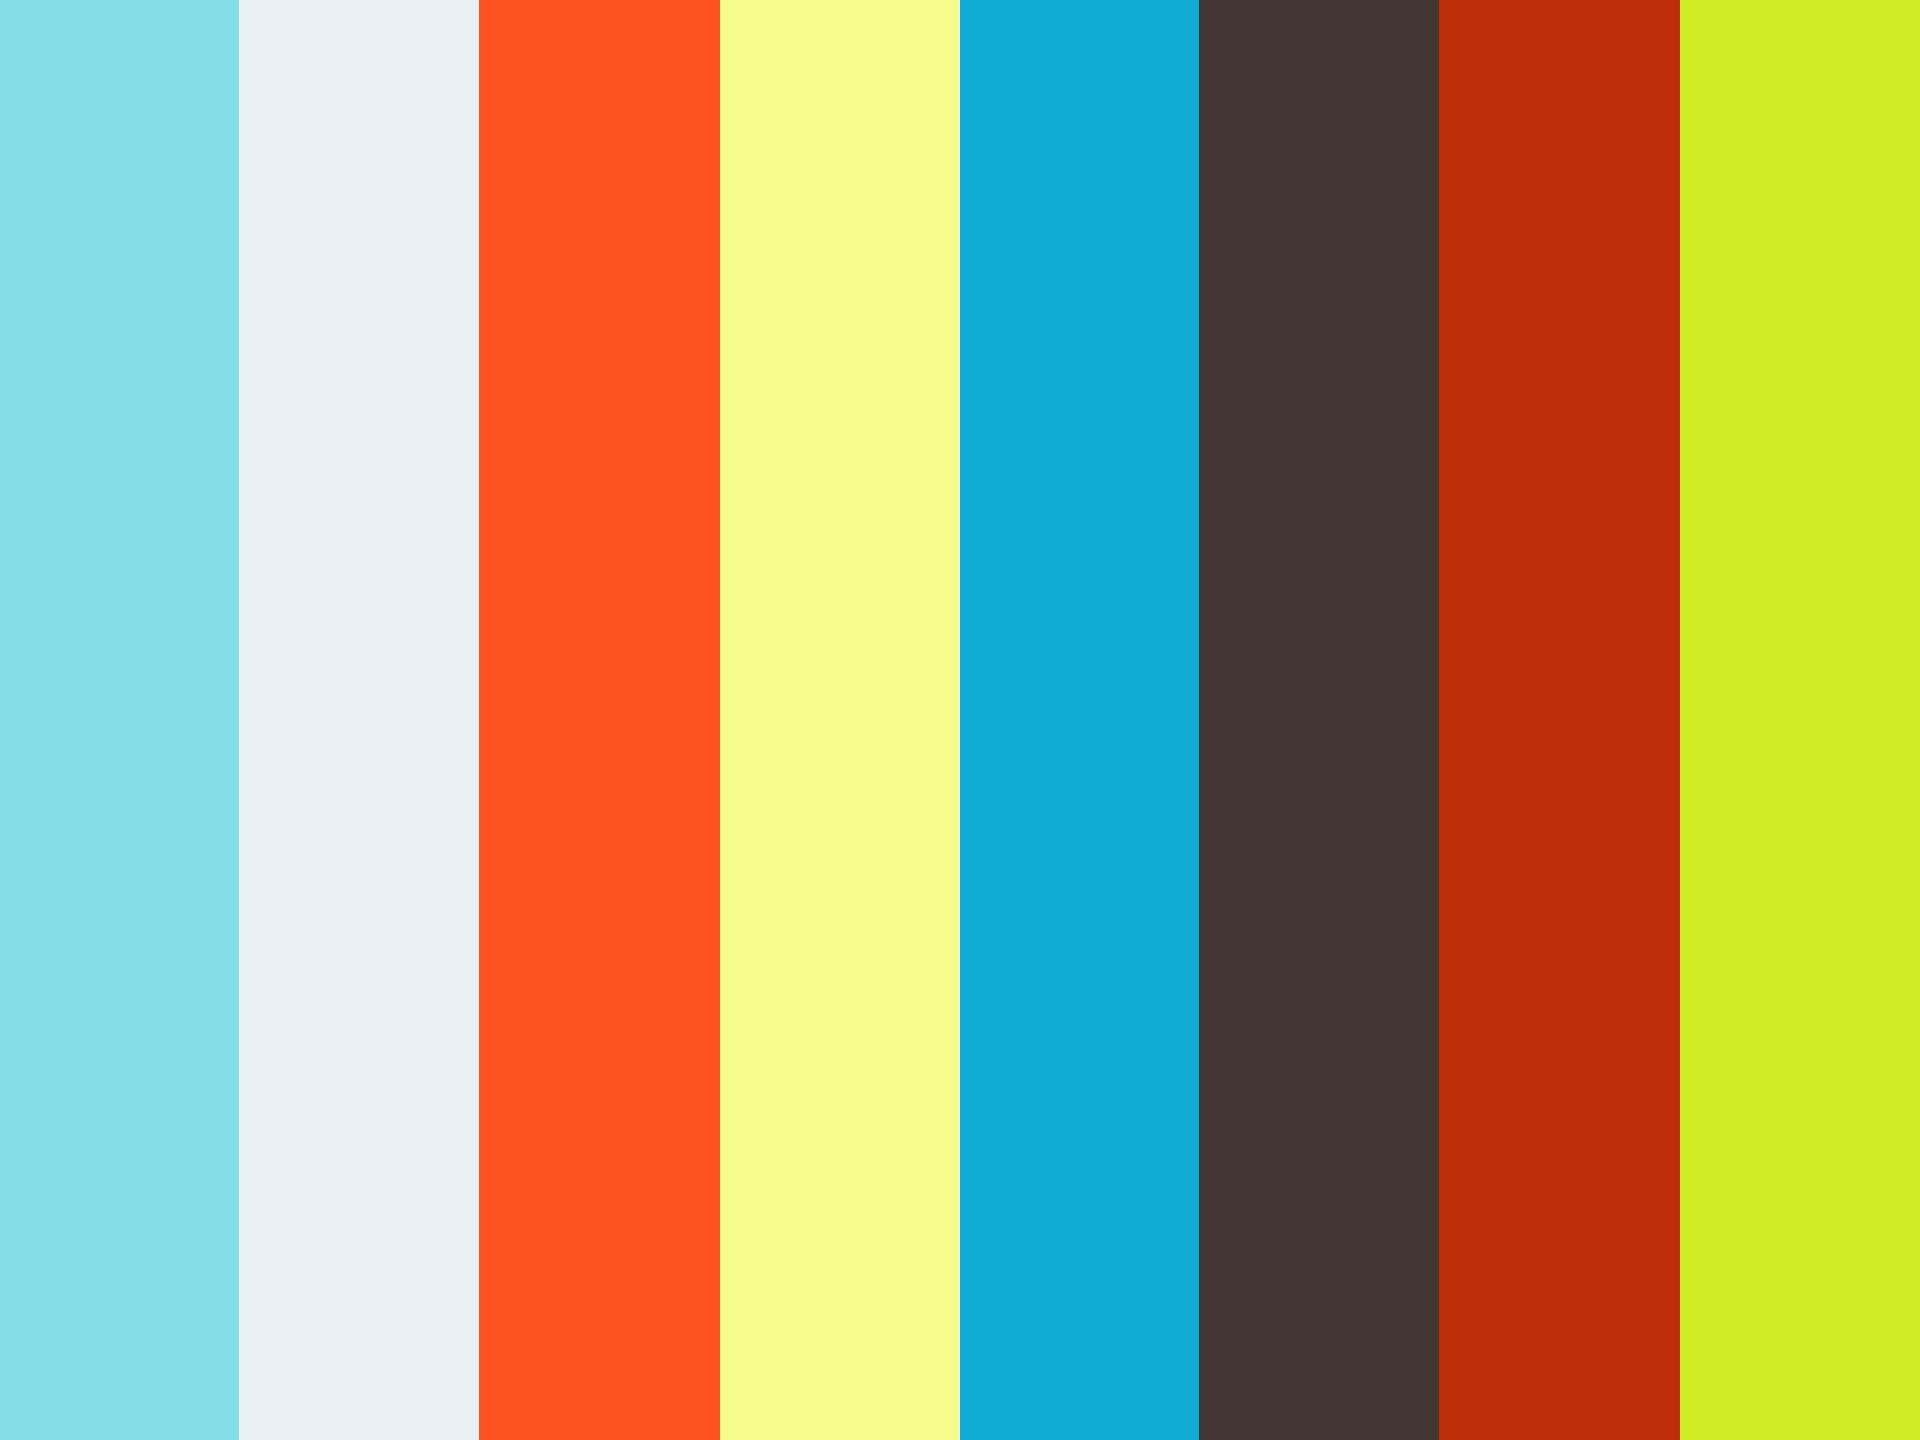 House of color house of kolor oz bases u color kit kandy pearl u house of kolor shimrin color chart u color wall nvjuhfo Gallery